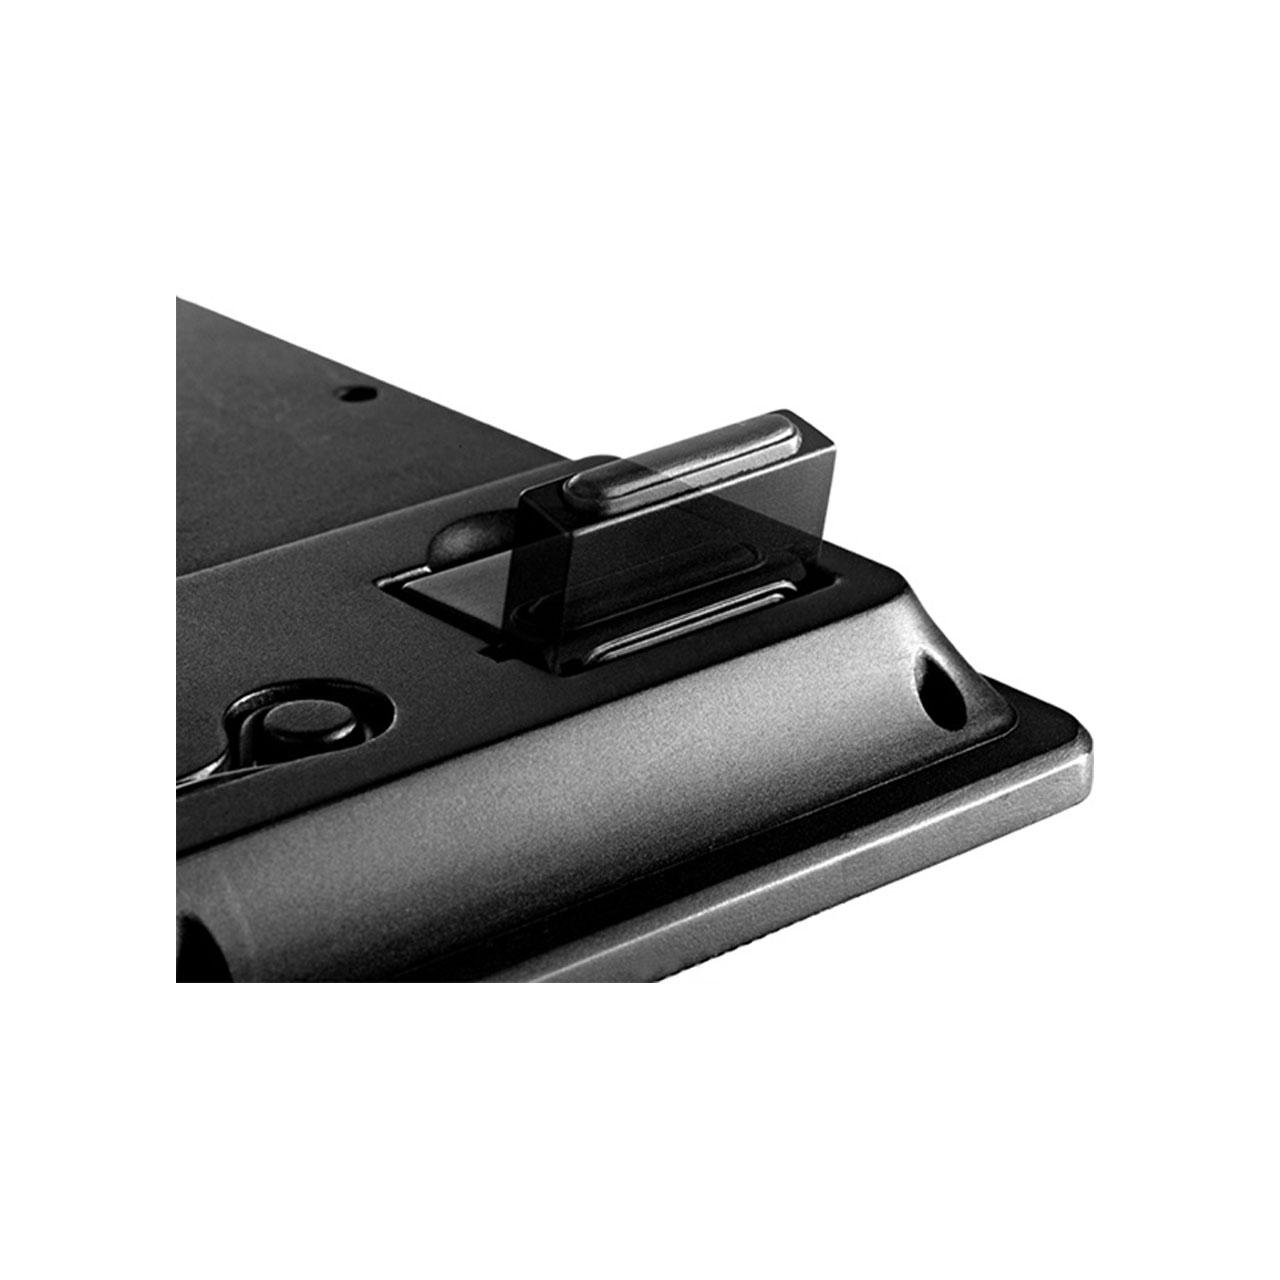 پایه-خنک-کننده66-کولر-2مستر-مدل--NotePal-I100